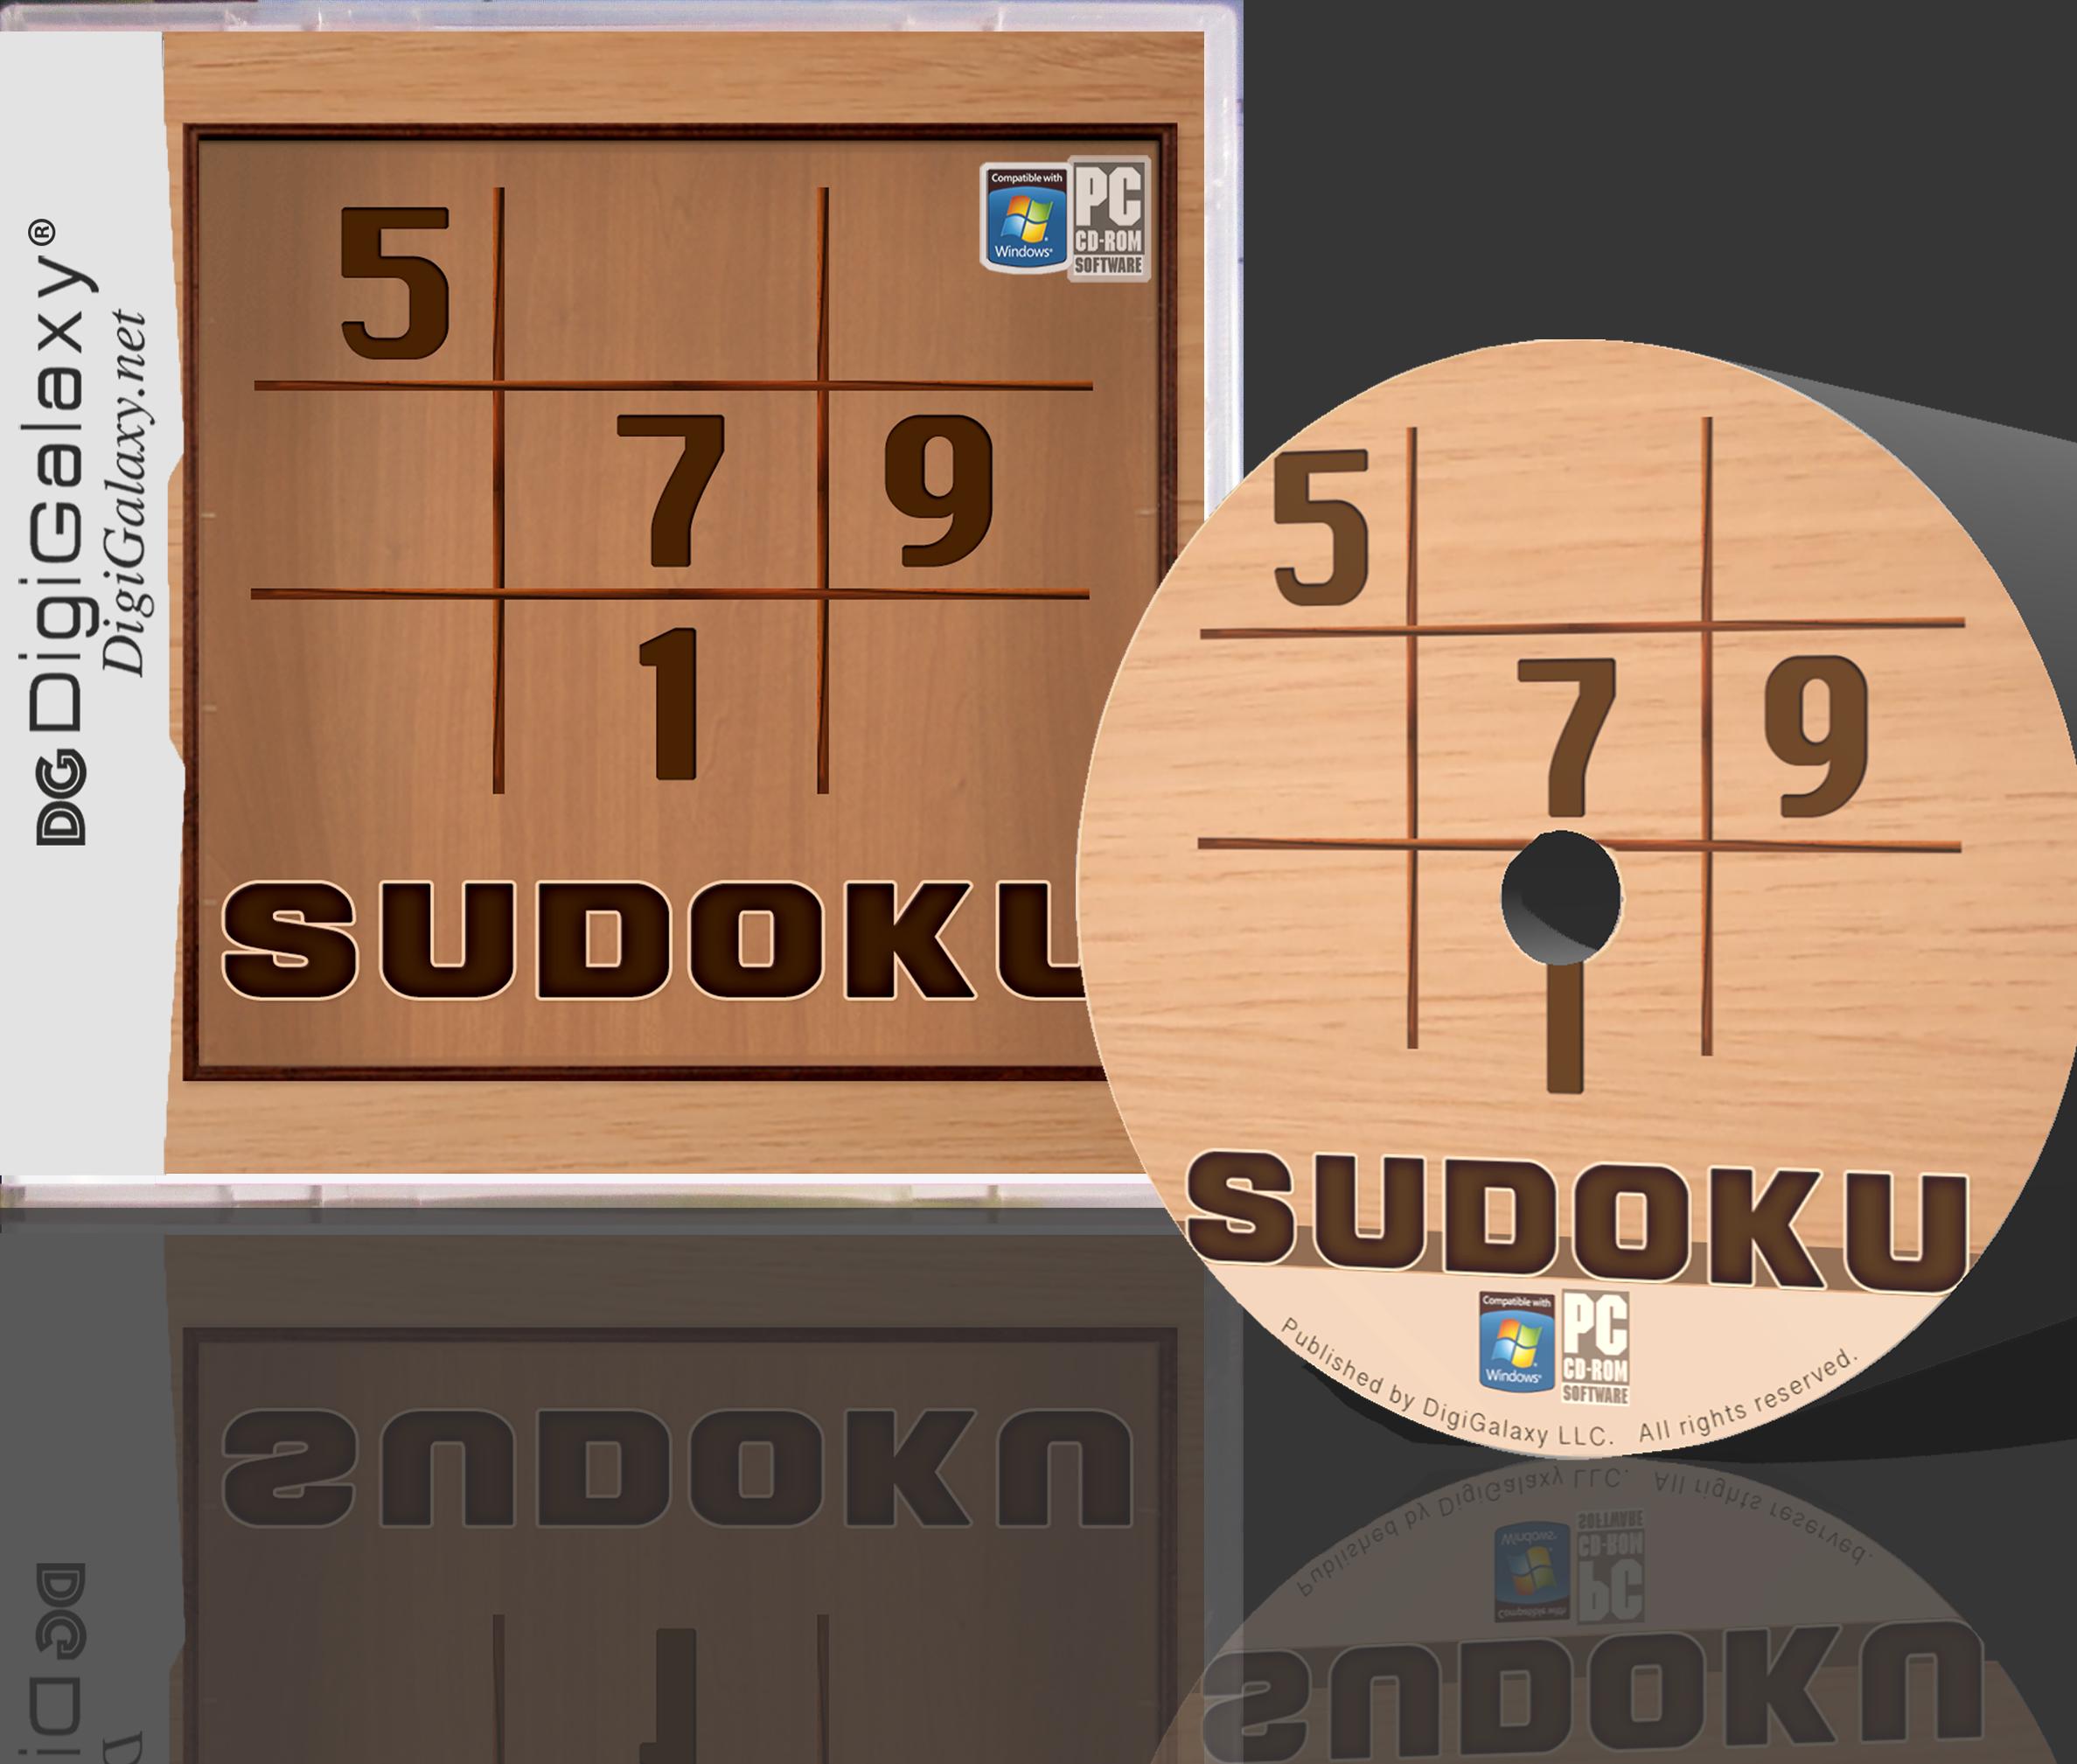 Sudoku Puzzles Logic puzzle games, Sudoku puzzles, Sudoku